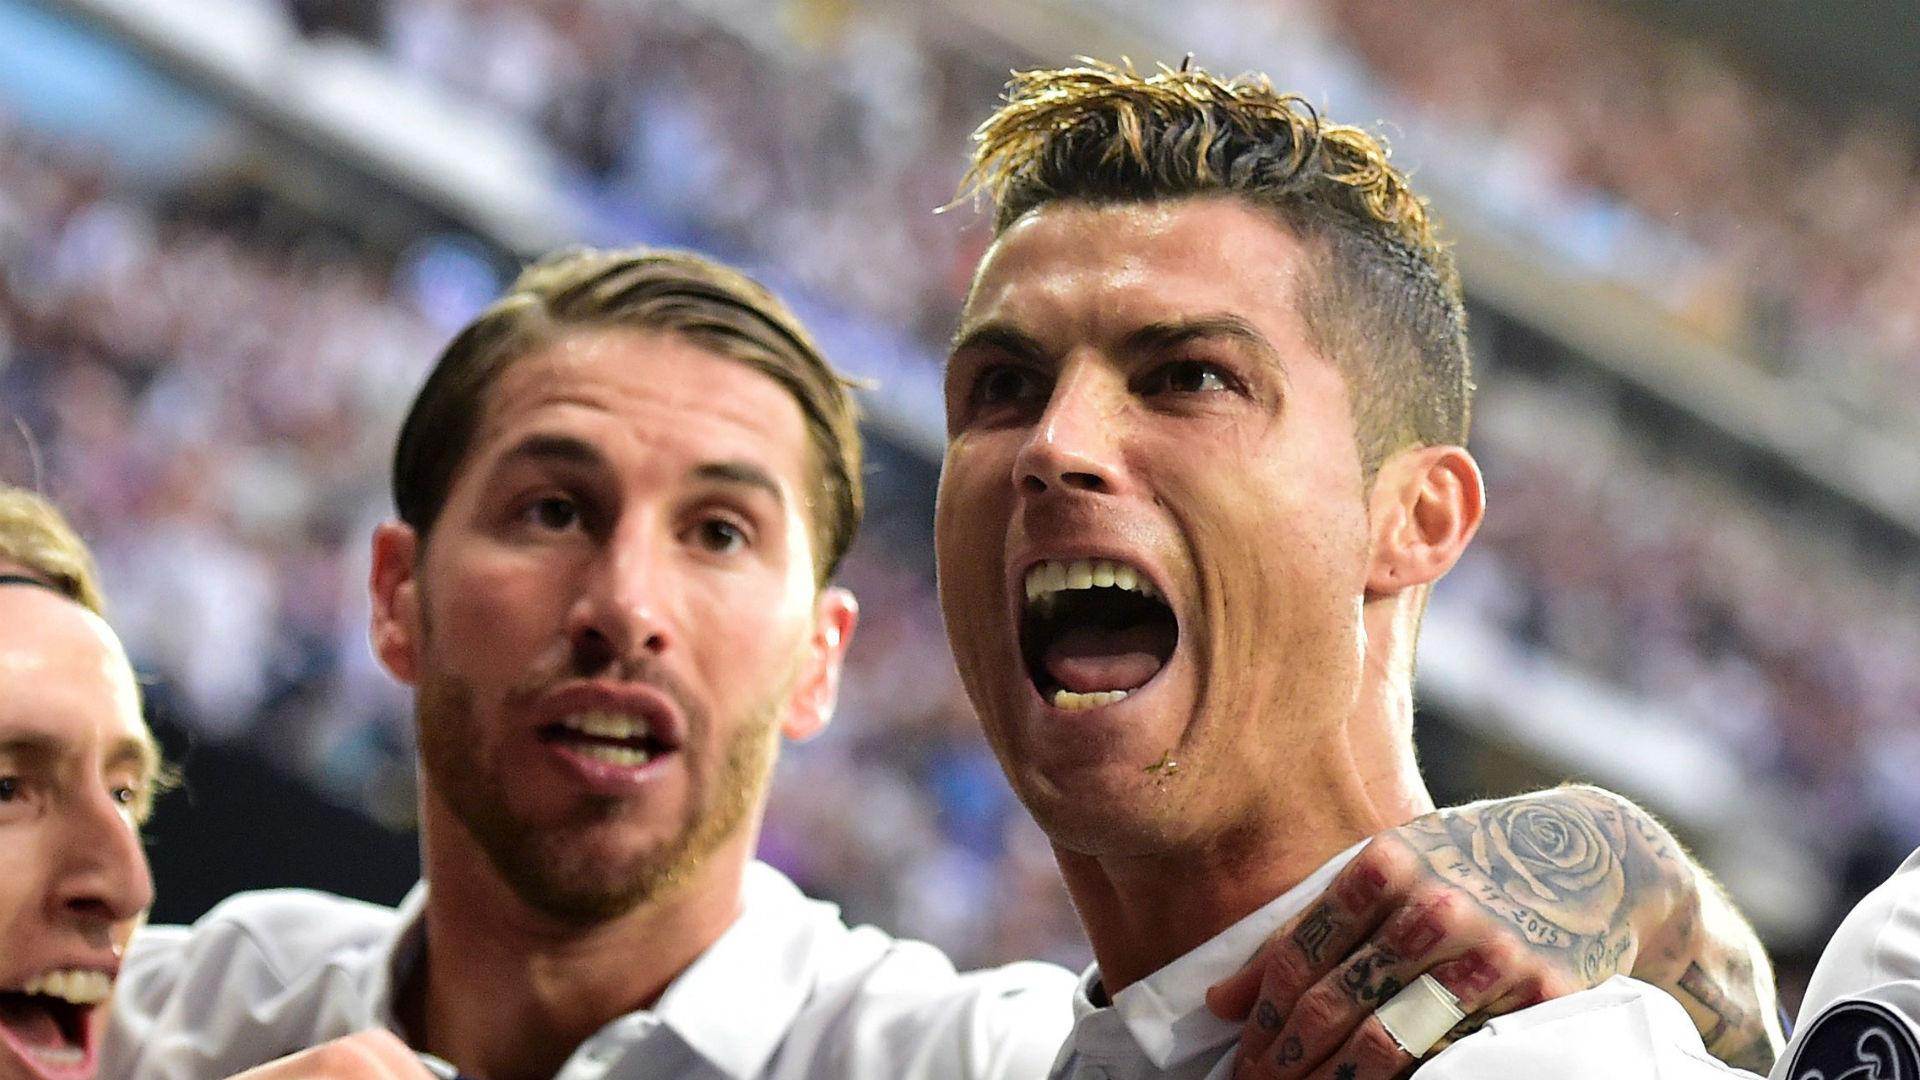 'Ramos & Real Madrid won't repeat Ronaldo mistake' – Skipper will sign new deal, says Valdano